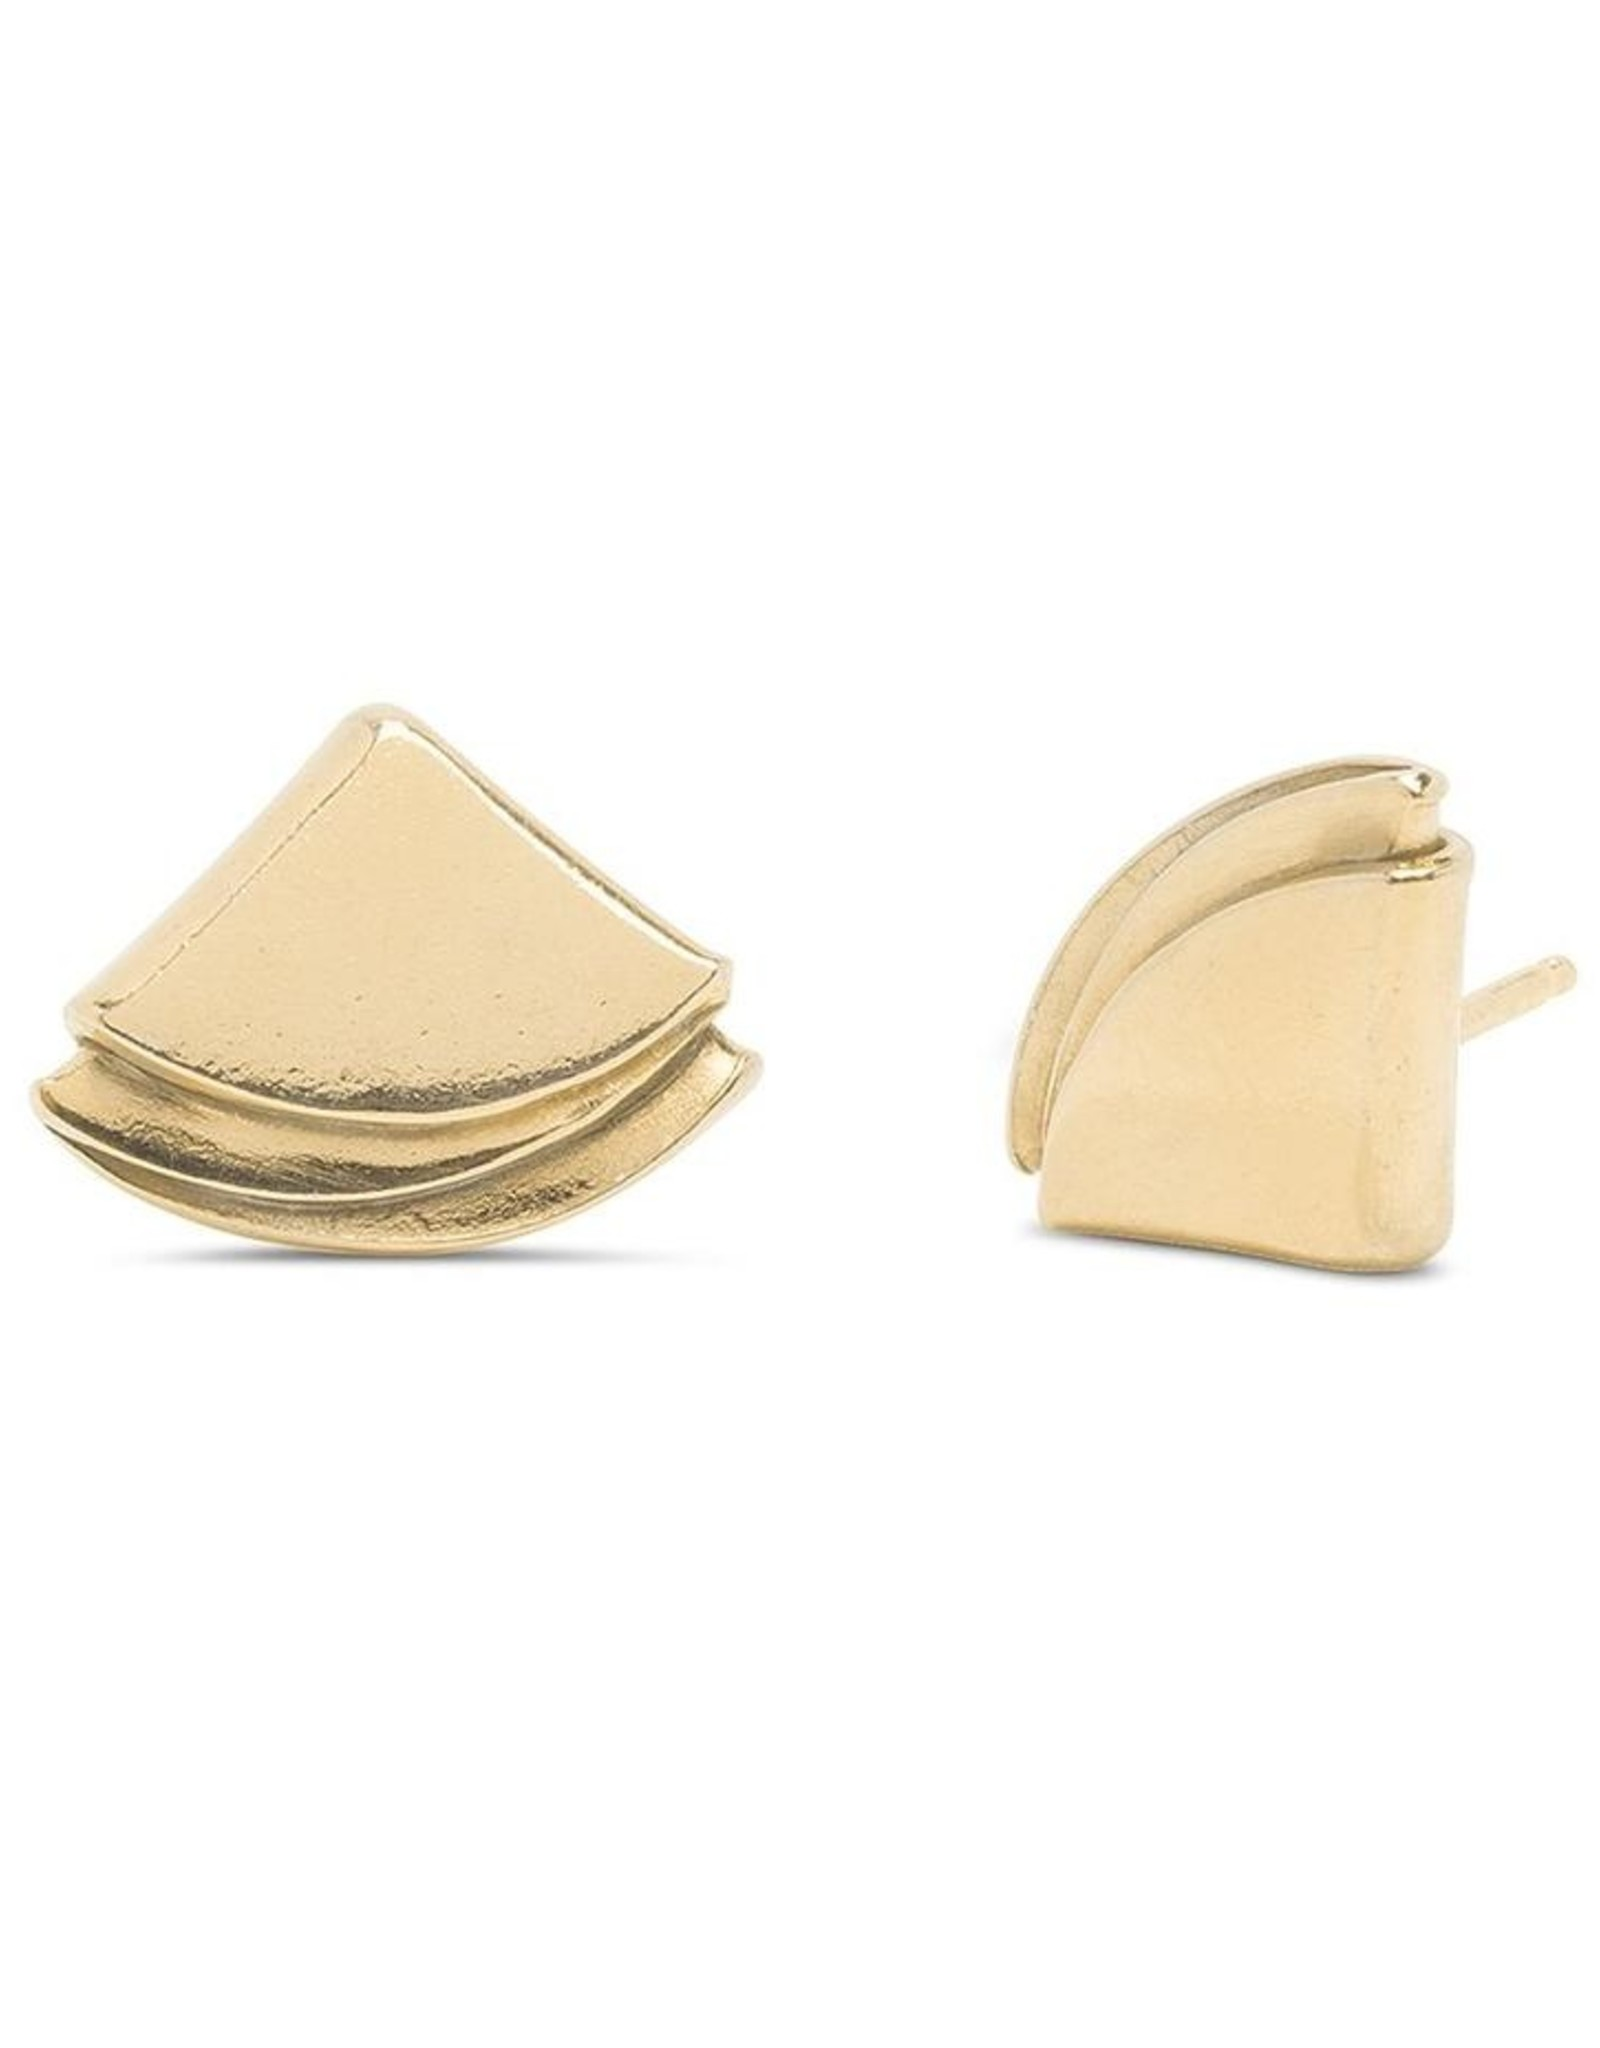 Kara Yoo Quarter Folded Studs